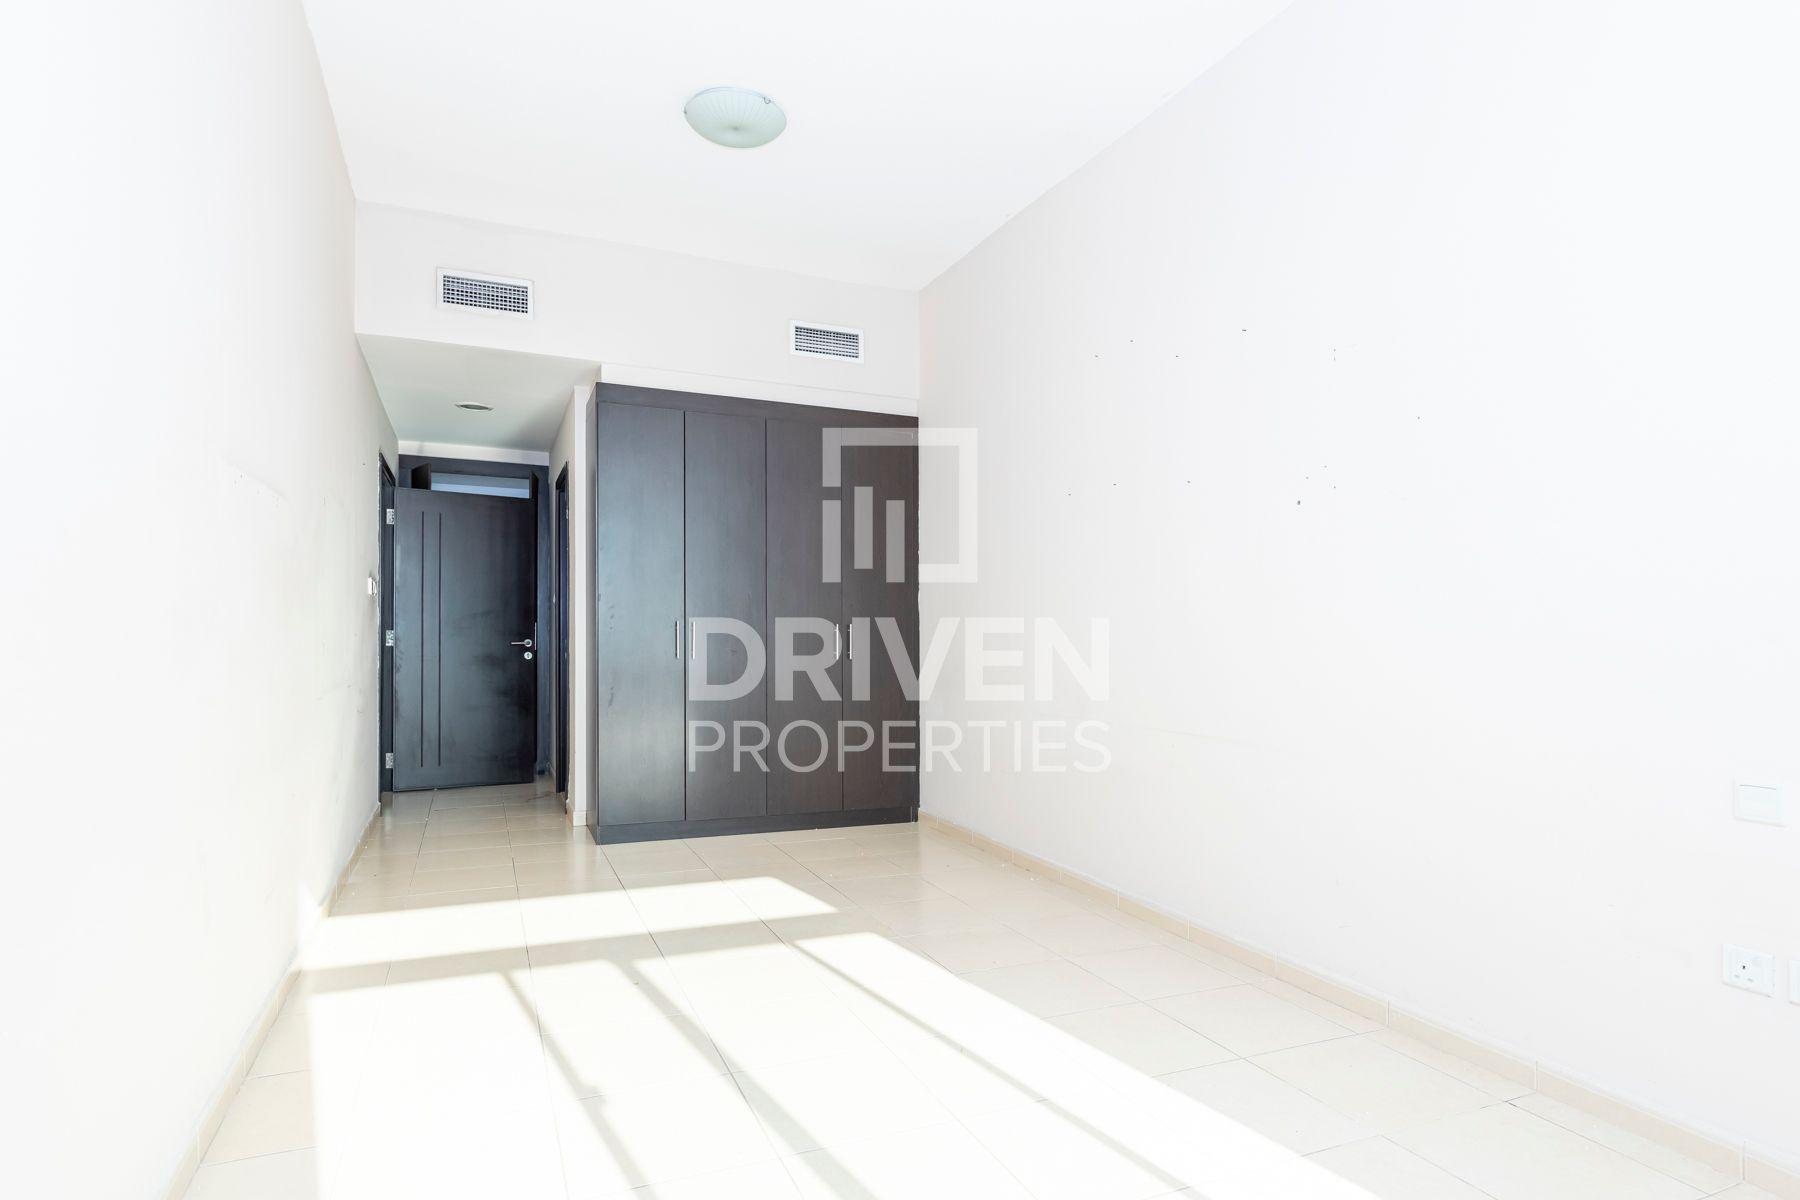 Apartment for Rent in Shams - Dubai Land